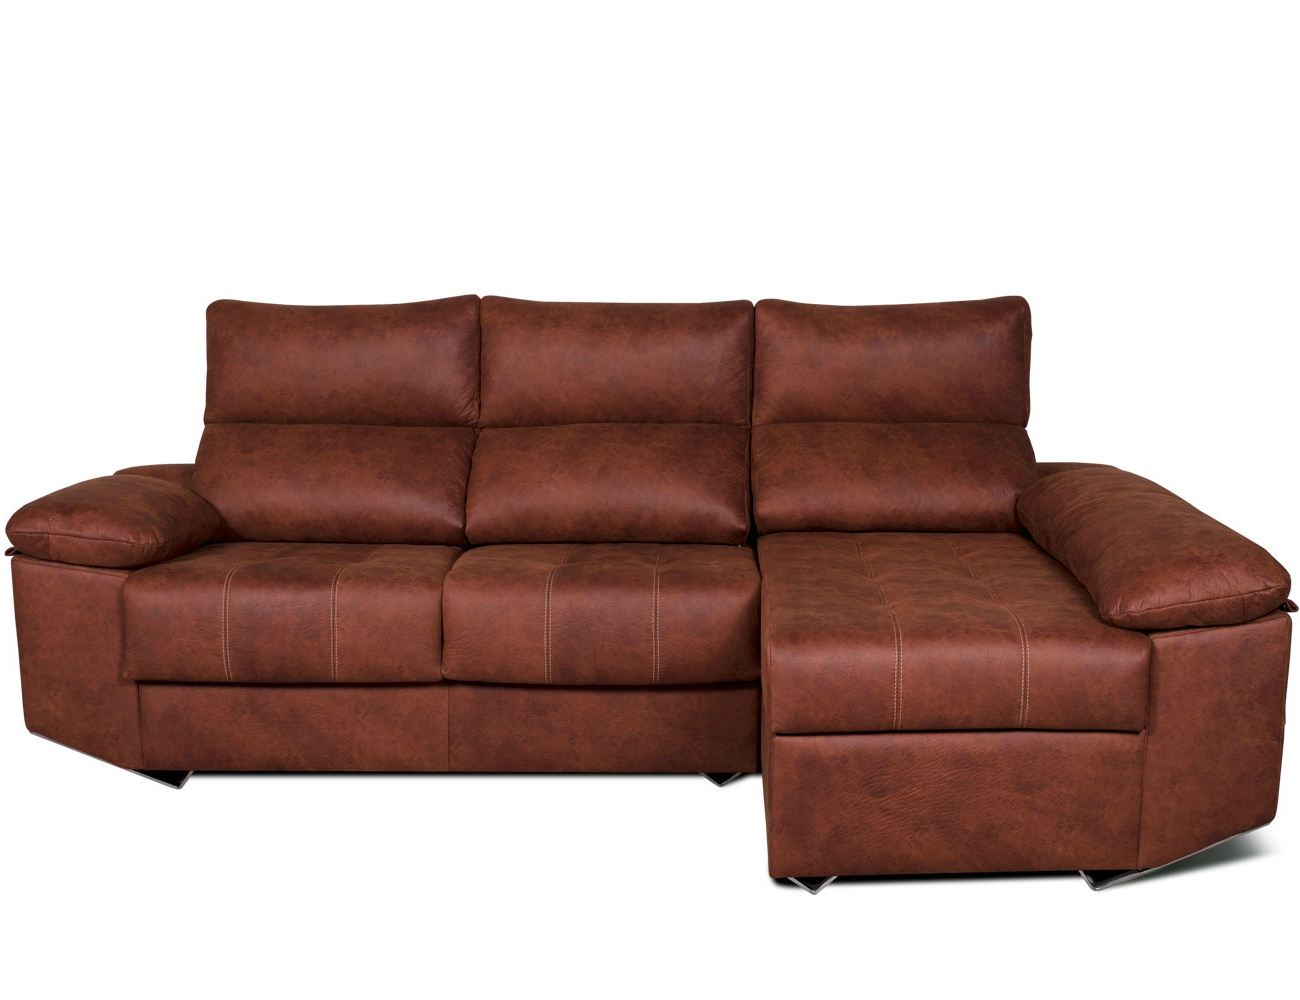 Sofa chaiselongue moderno patas forma tejido anti manchas 2